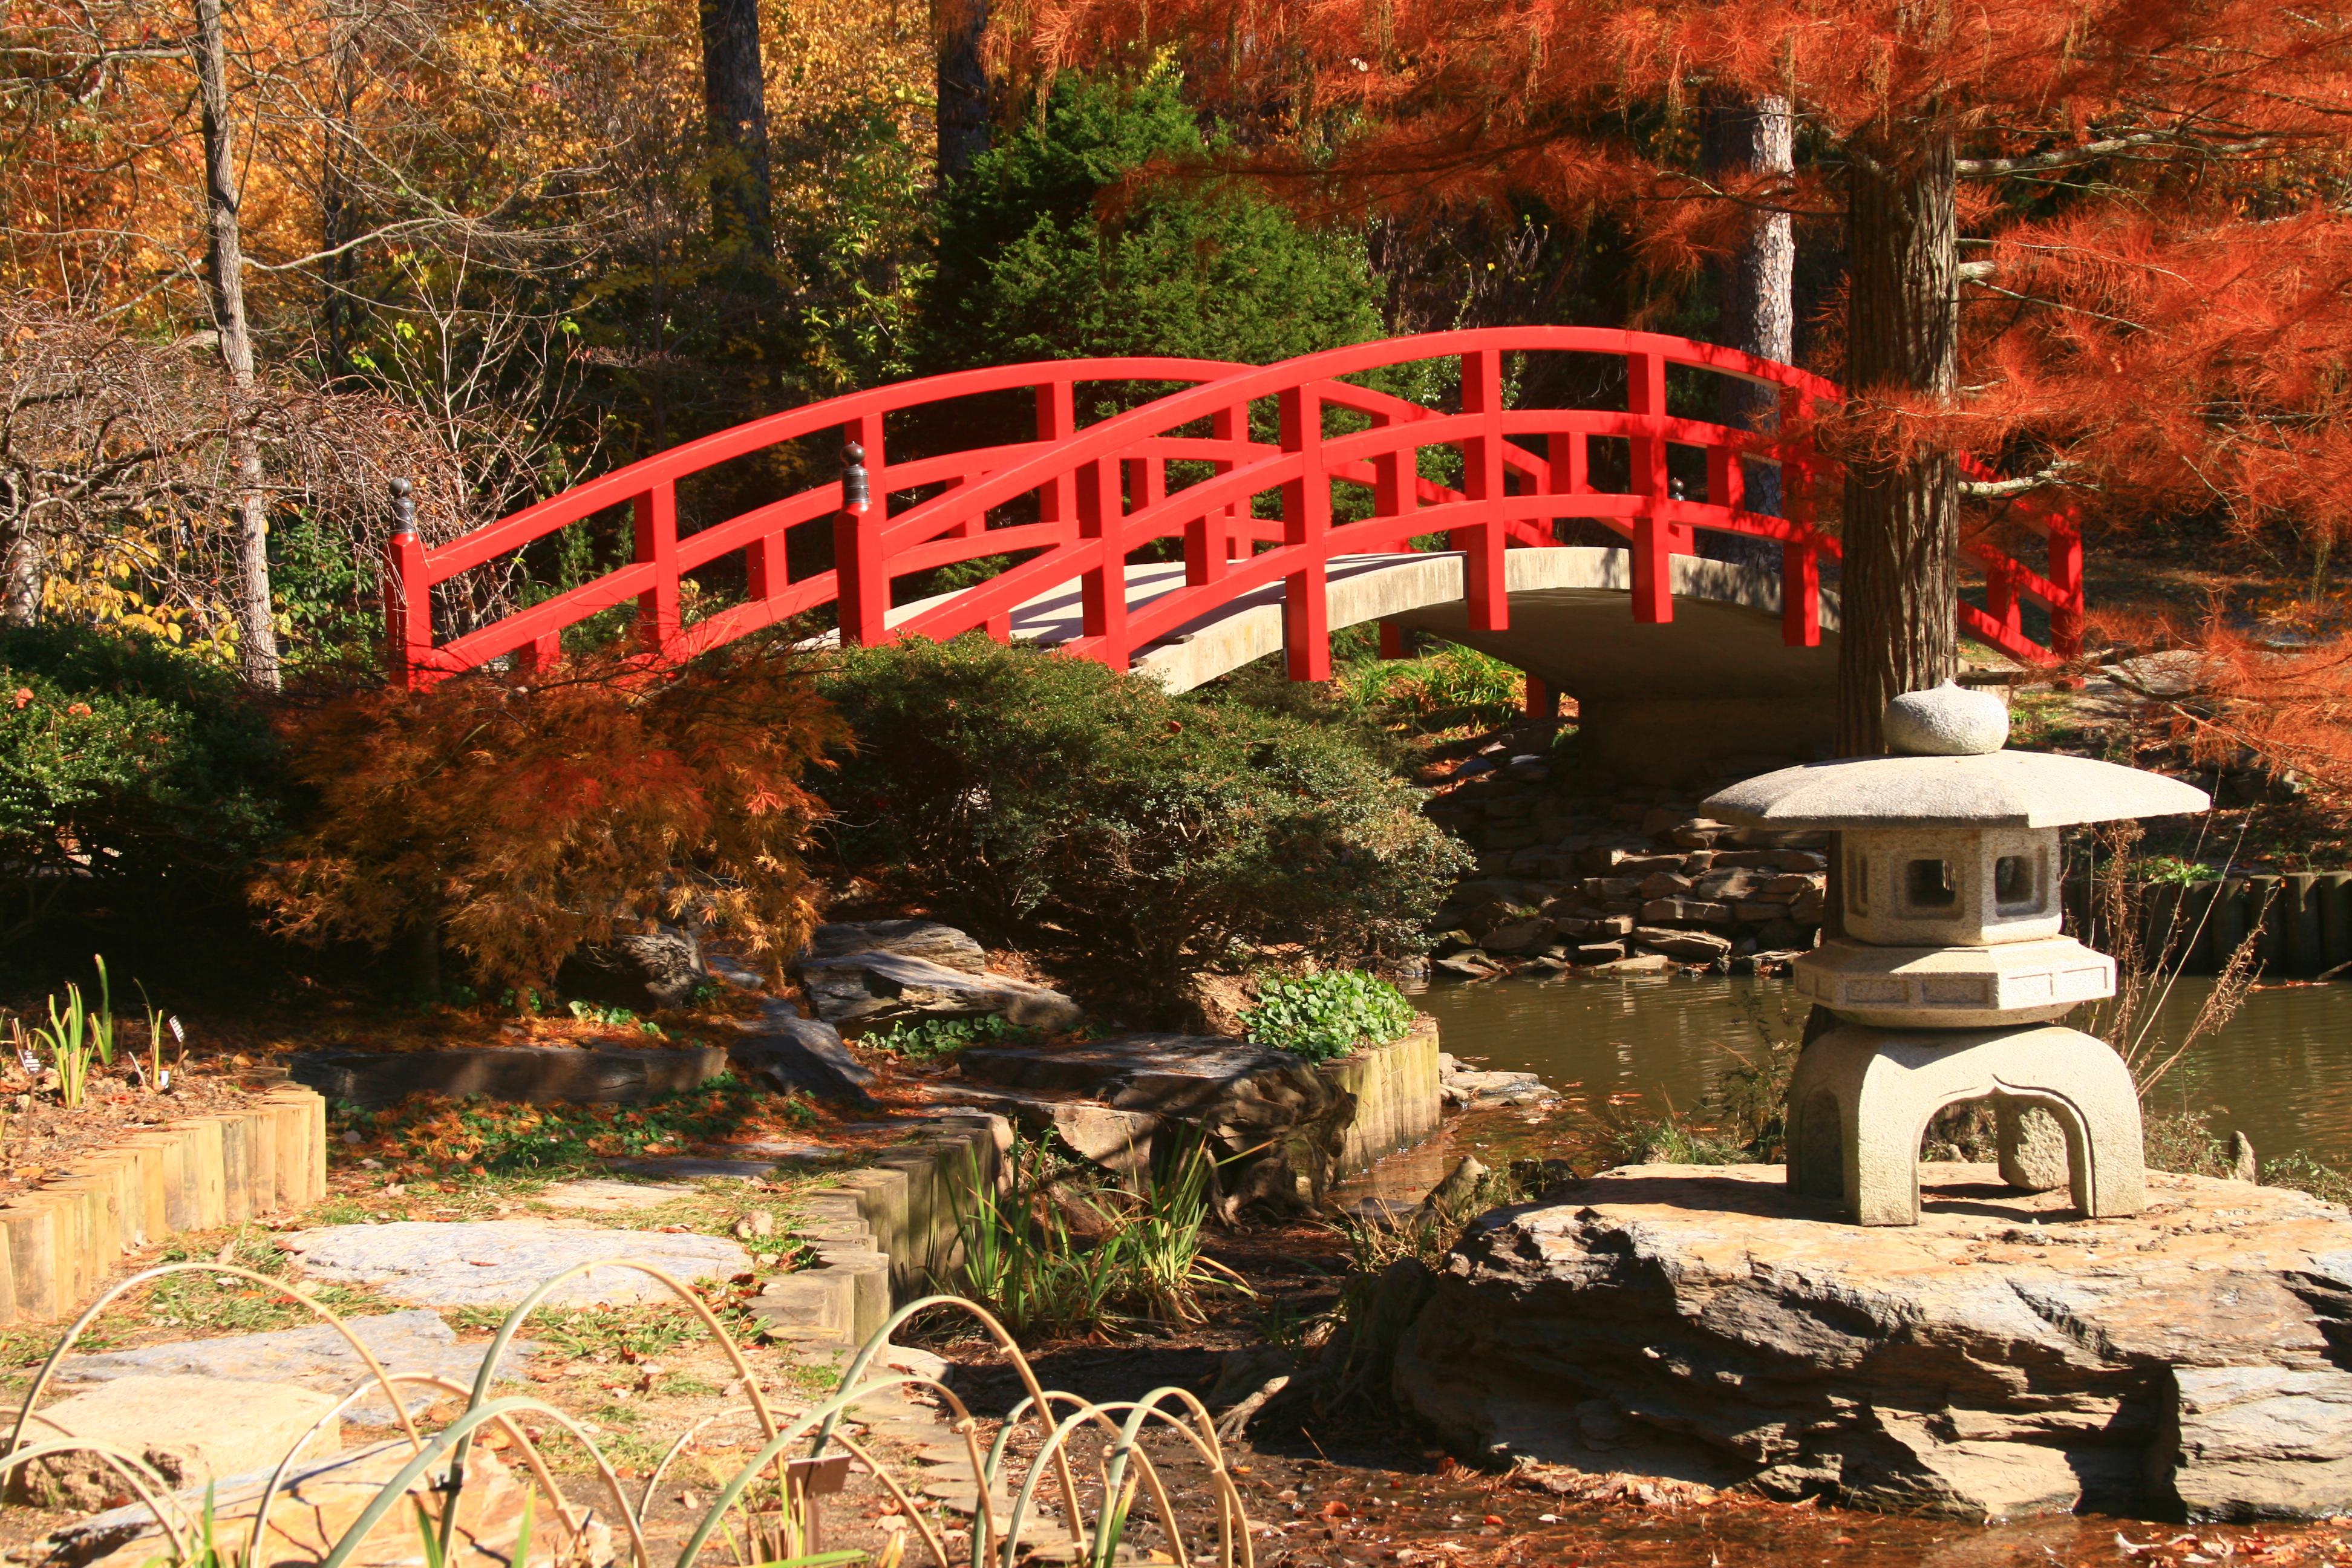 File:Duke Gardens Bridge.jpg - Wikimedia Commons